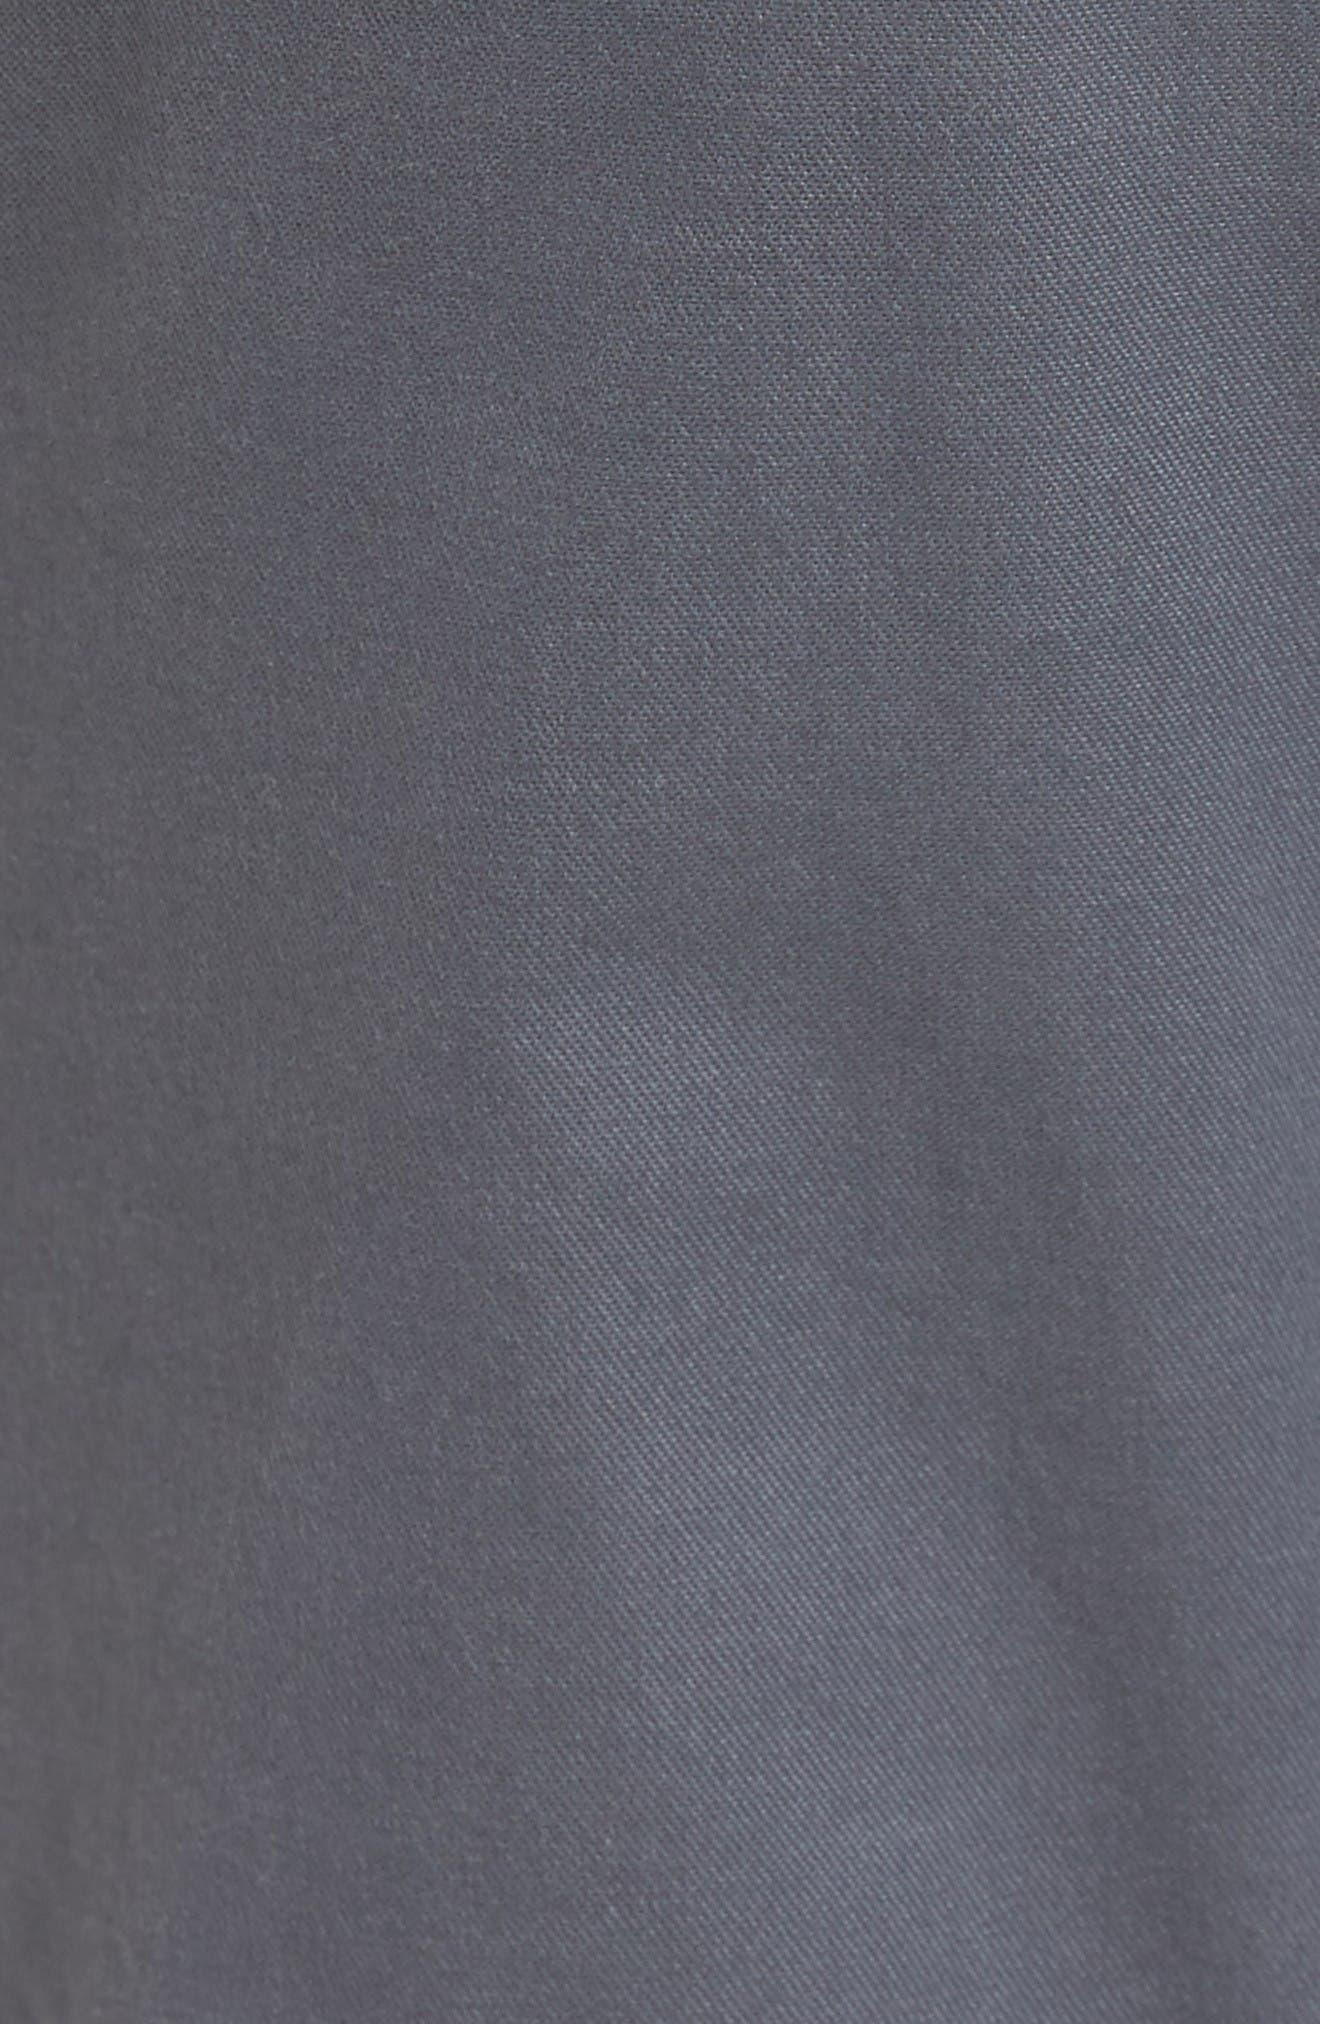 Salerno Stretch Woven Jogger Pants,                             Alternate thumbnail 5, color,                             Grey